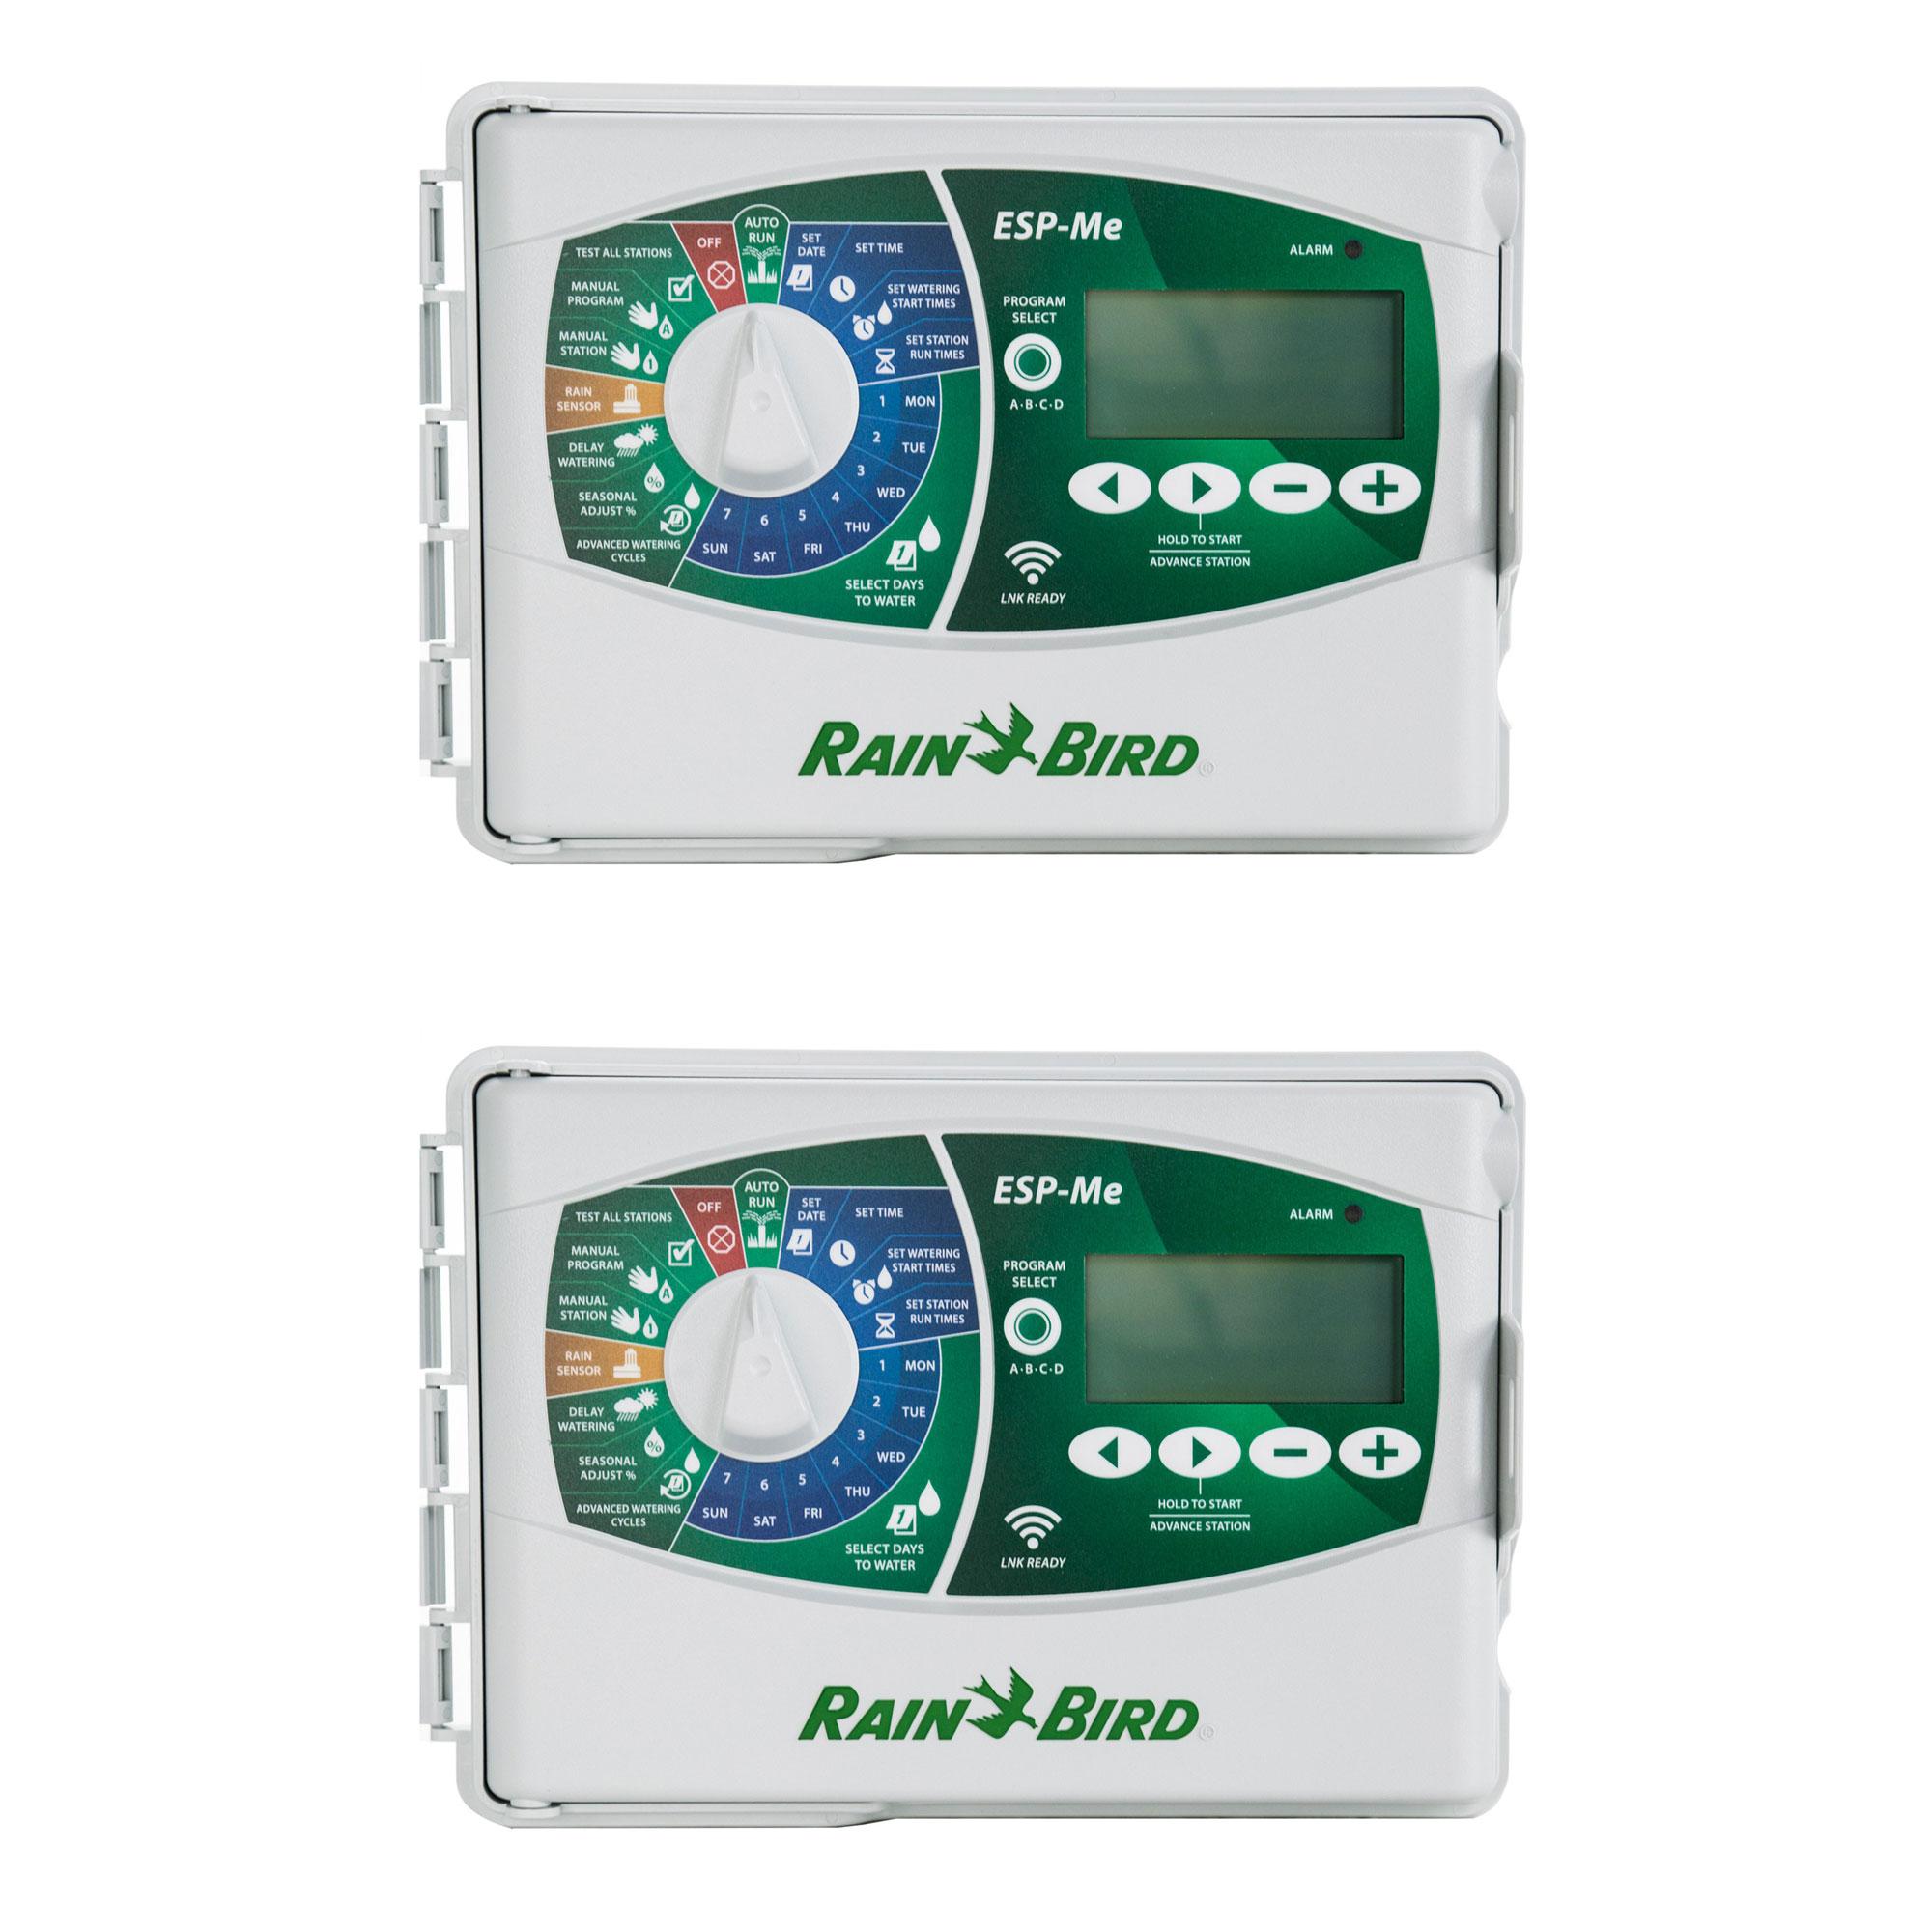 Rain Bird Smart WiFi 10 Station Irrigation Sprinkler Controller Timer (2 Pack)